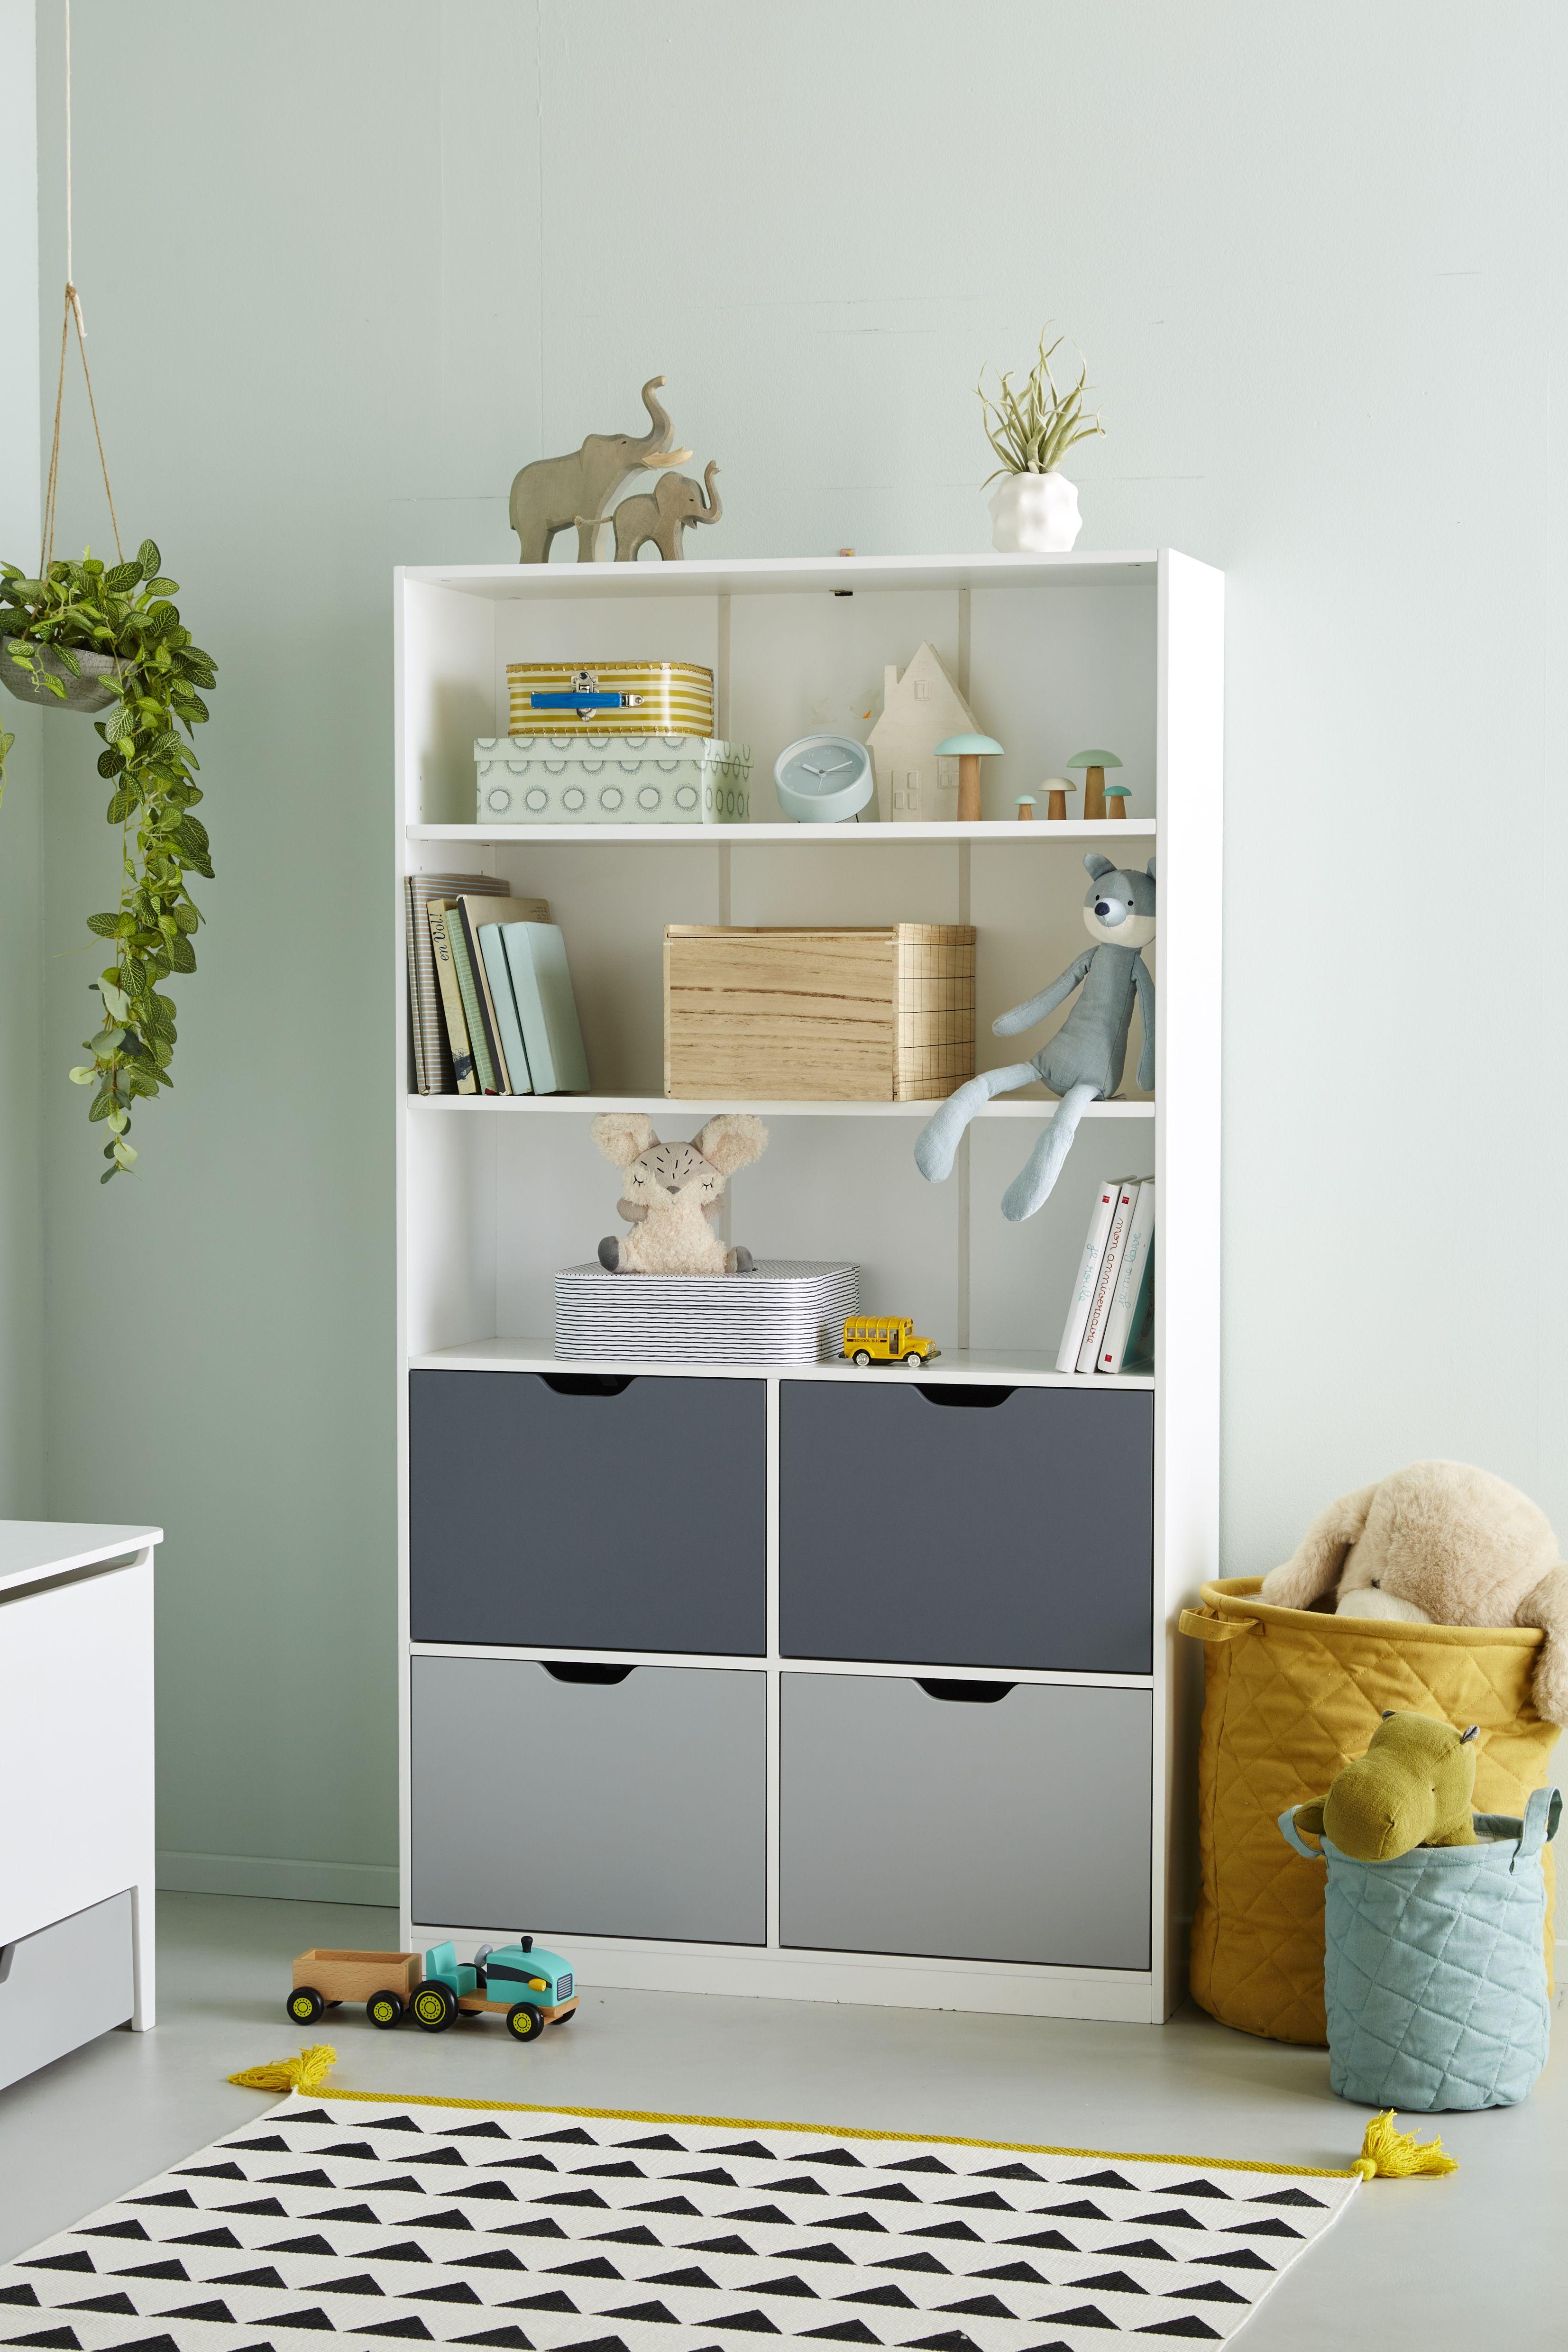 Etagere Bibliotheque Ligne Passe Passe Tricolore Vertbaudet Chambre Bebe Vertbaudet Idee Bibliotheque Bibliotheque Chambre Enfant